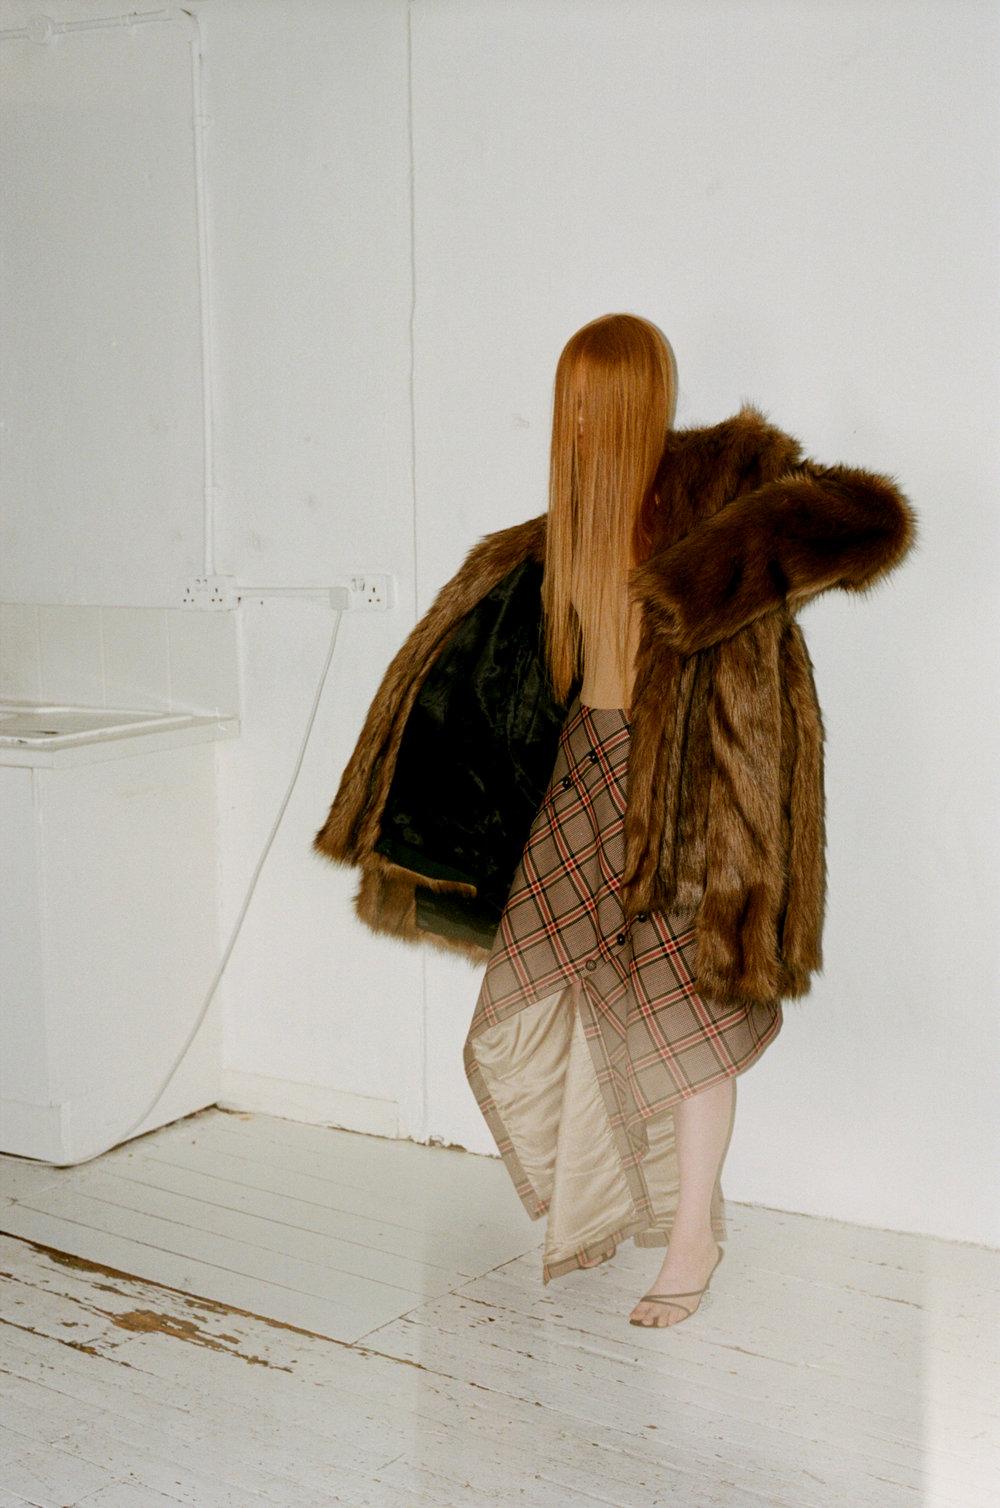 rokh_ss19_collection_fashion_vogue_lookbook_009.jpg